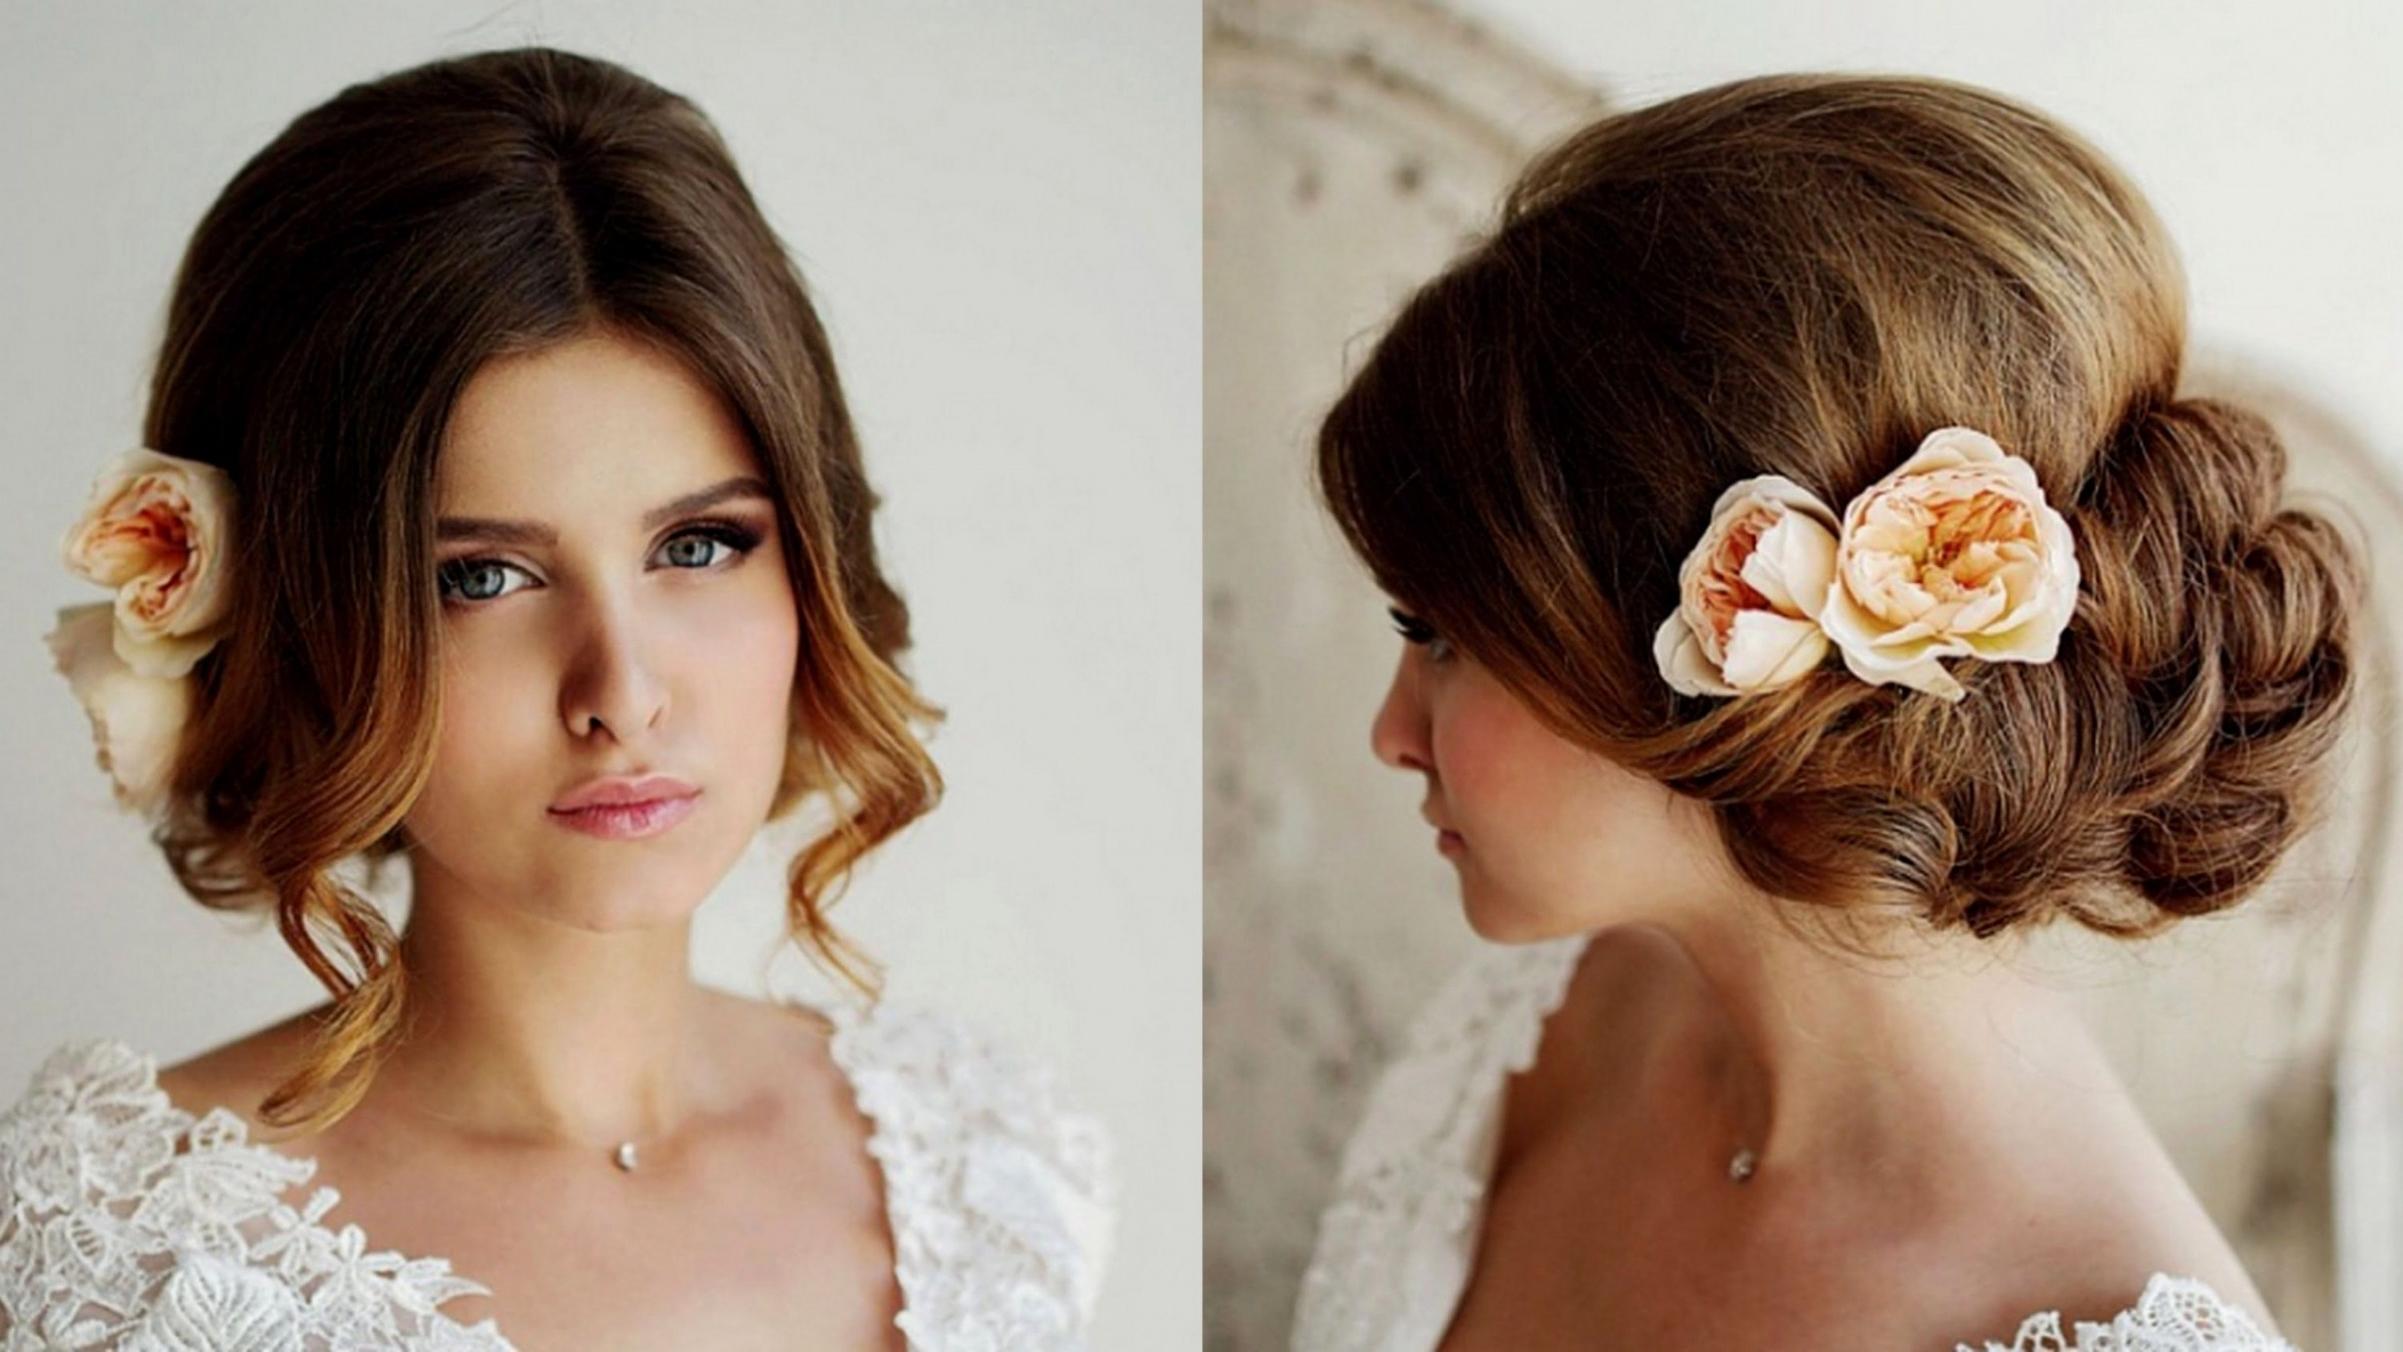 Beach Wedding Hairstyles Bridesmaid – Wedding Party Decoration With Regard To Recent Beach Wedding Hairstyles (View 14 of 15)